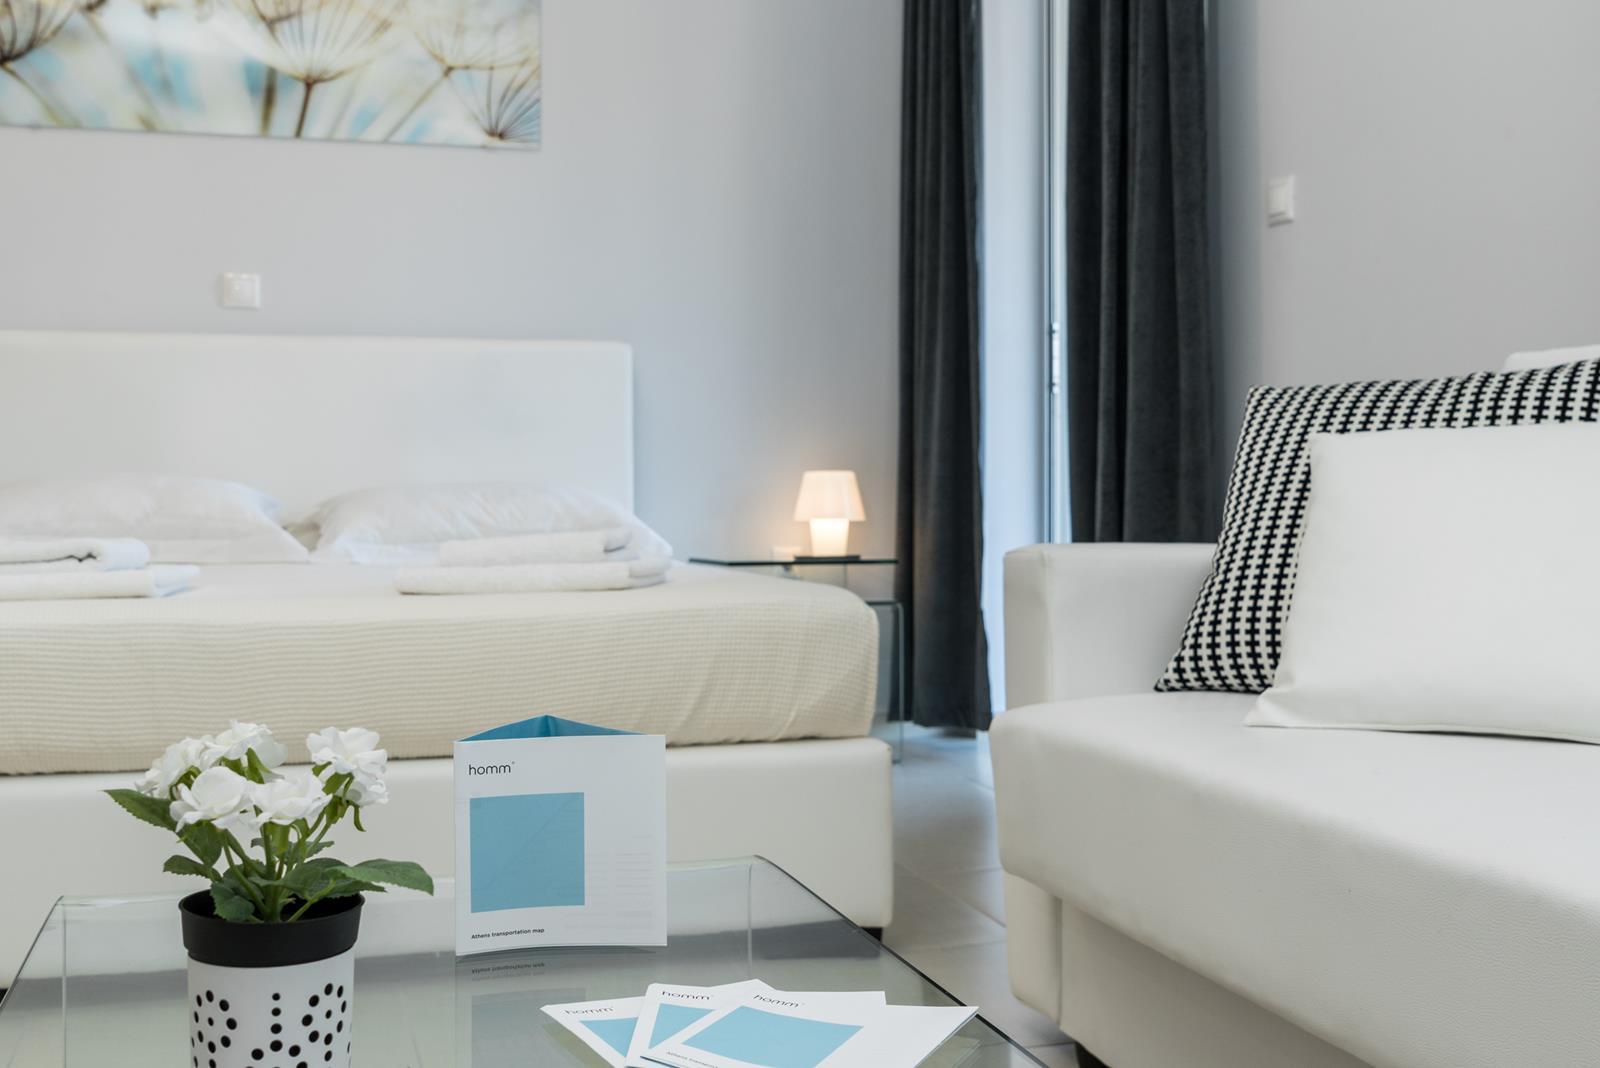 athens accommodation - Alekos Apartments & Suites